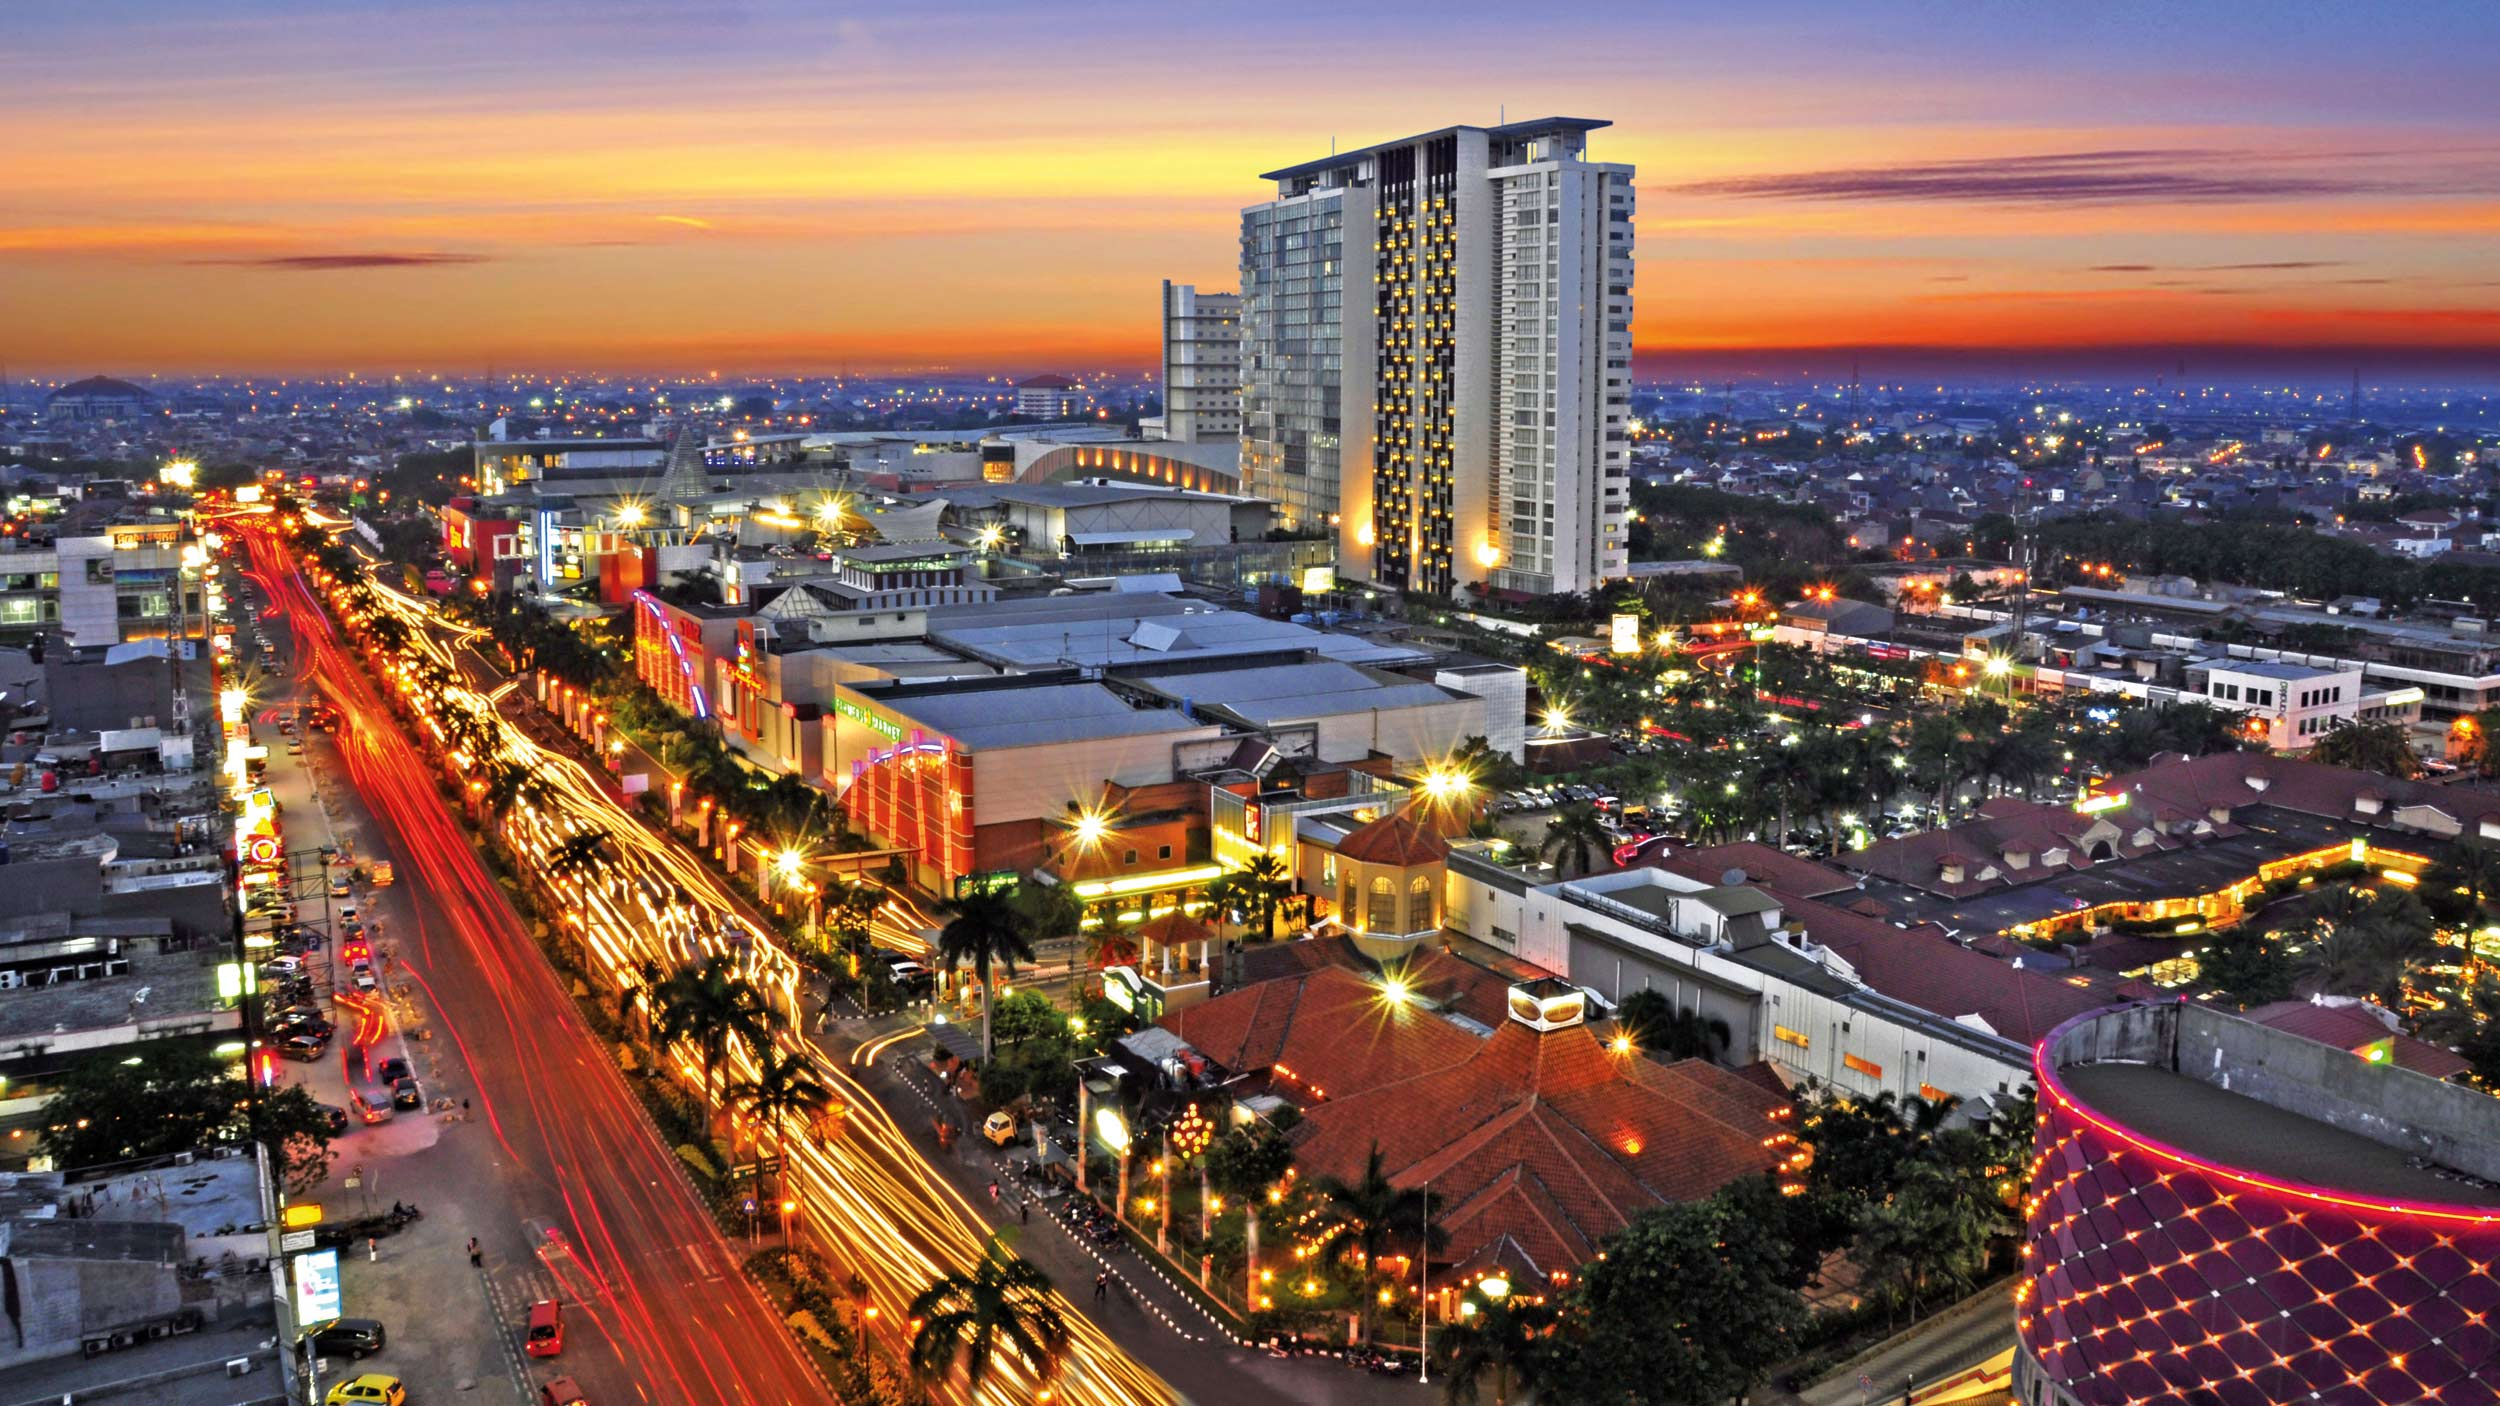 SUMMARECON MAL KELAPA GADING (MKG) – Jakarta, Indonesia